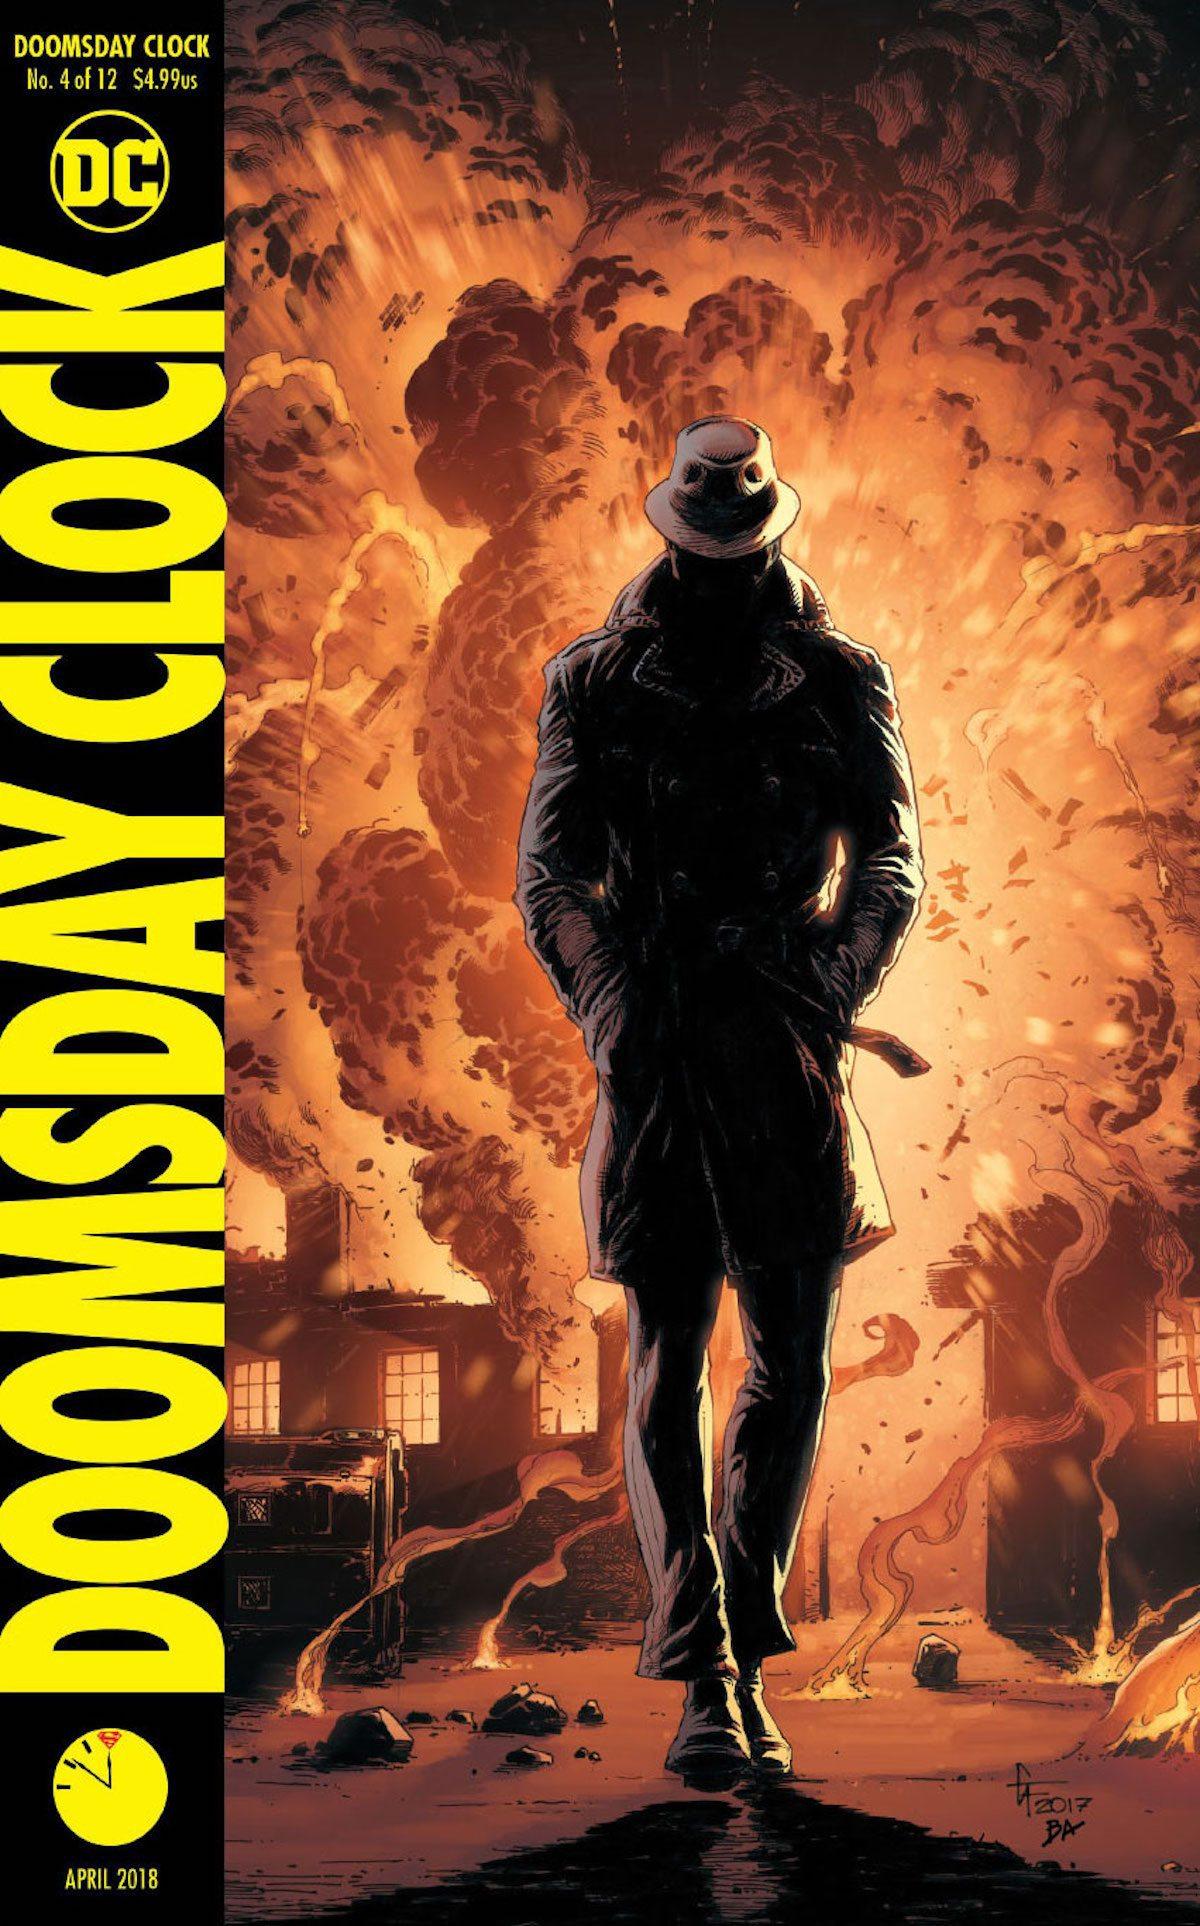 Doomsday Clock #4 cover